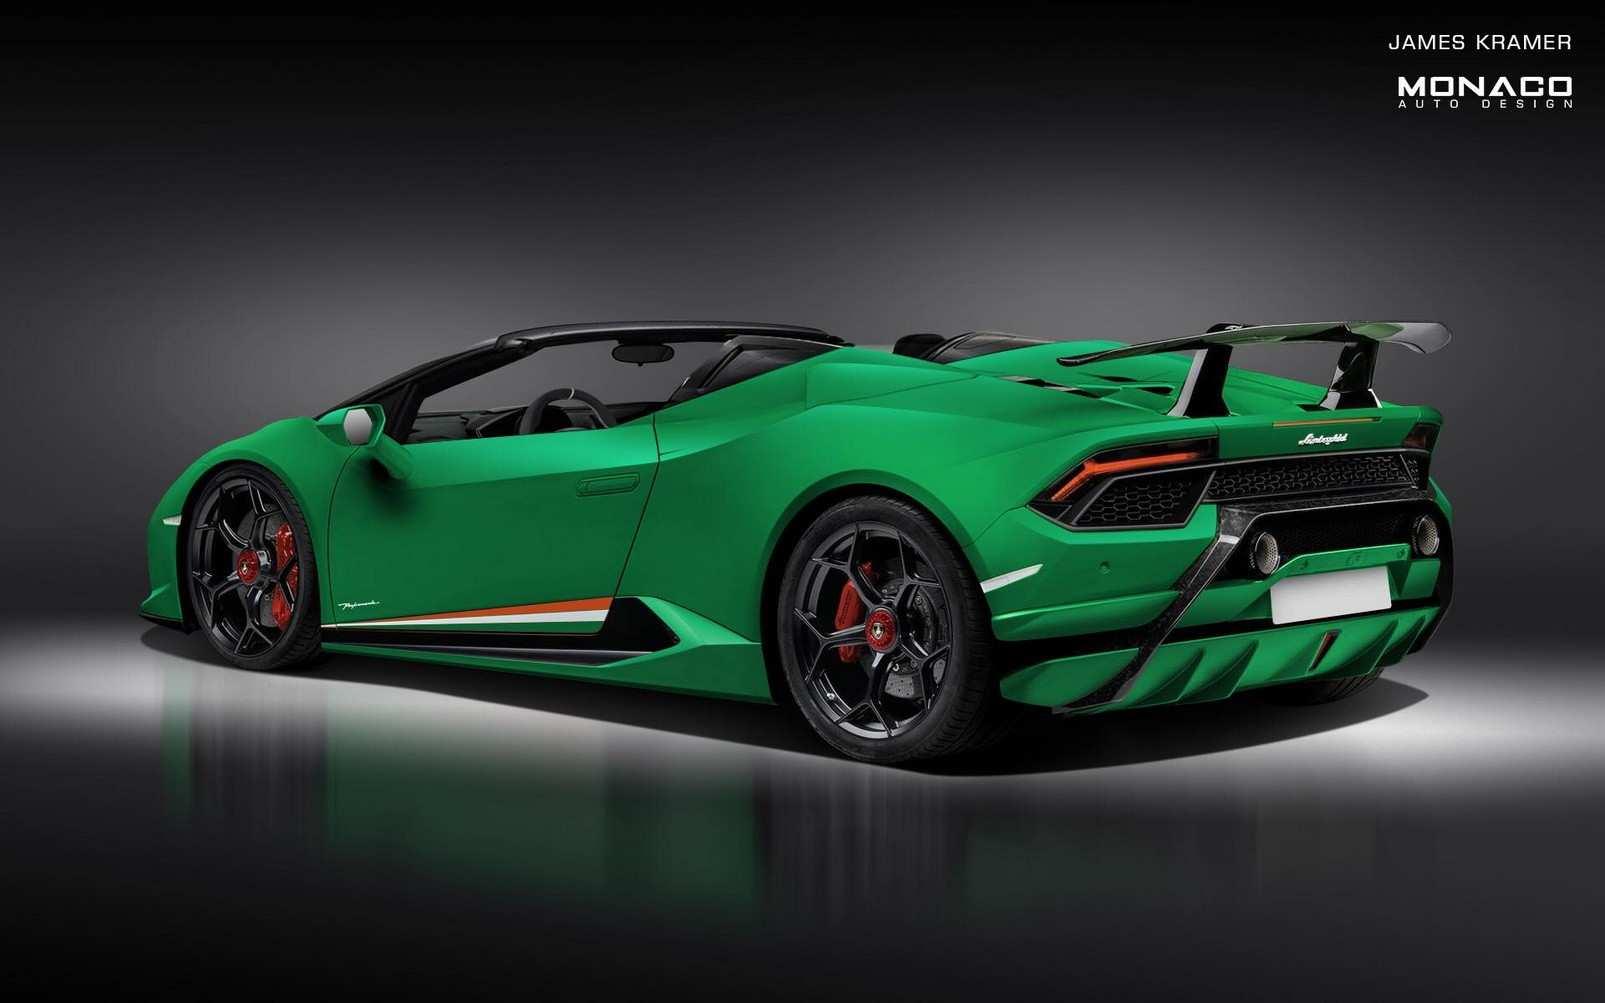 85 New 2019 Lamborghini Spyder Images by 2019 Lamborghini Spyder